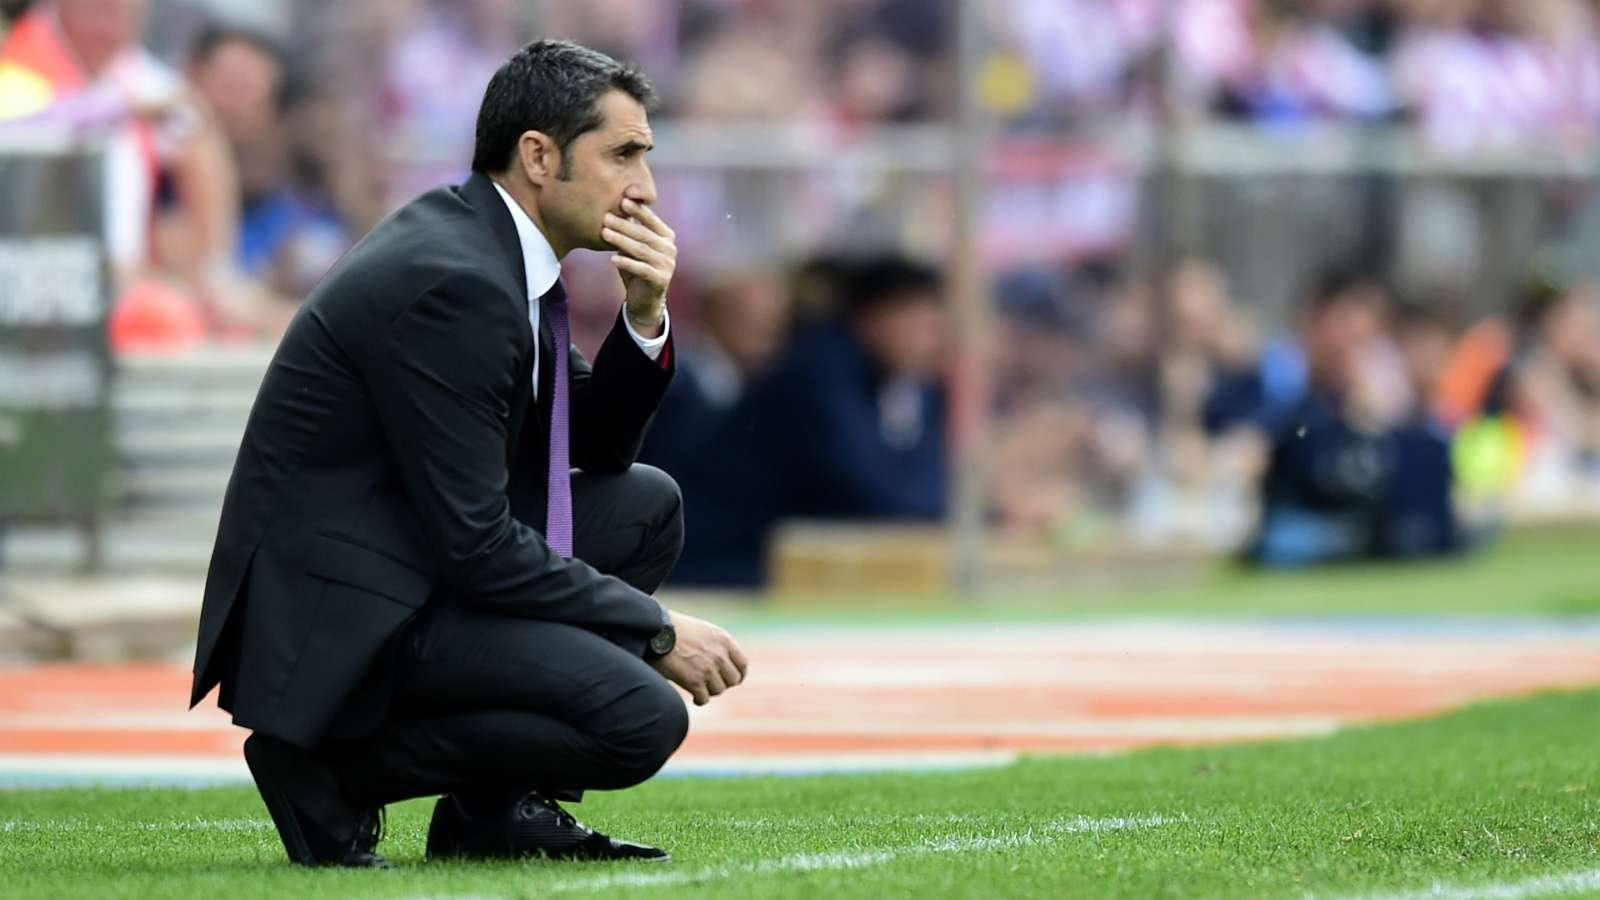 Real Madrid and Bilbao - Valverde the last victors against Real Madrid